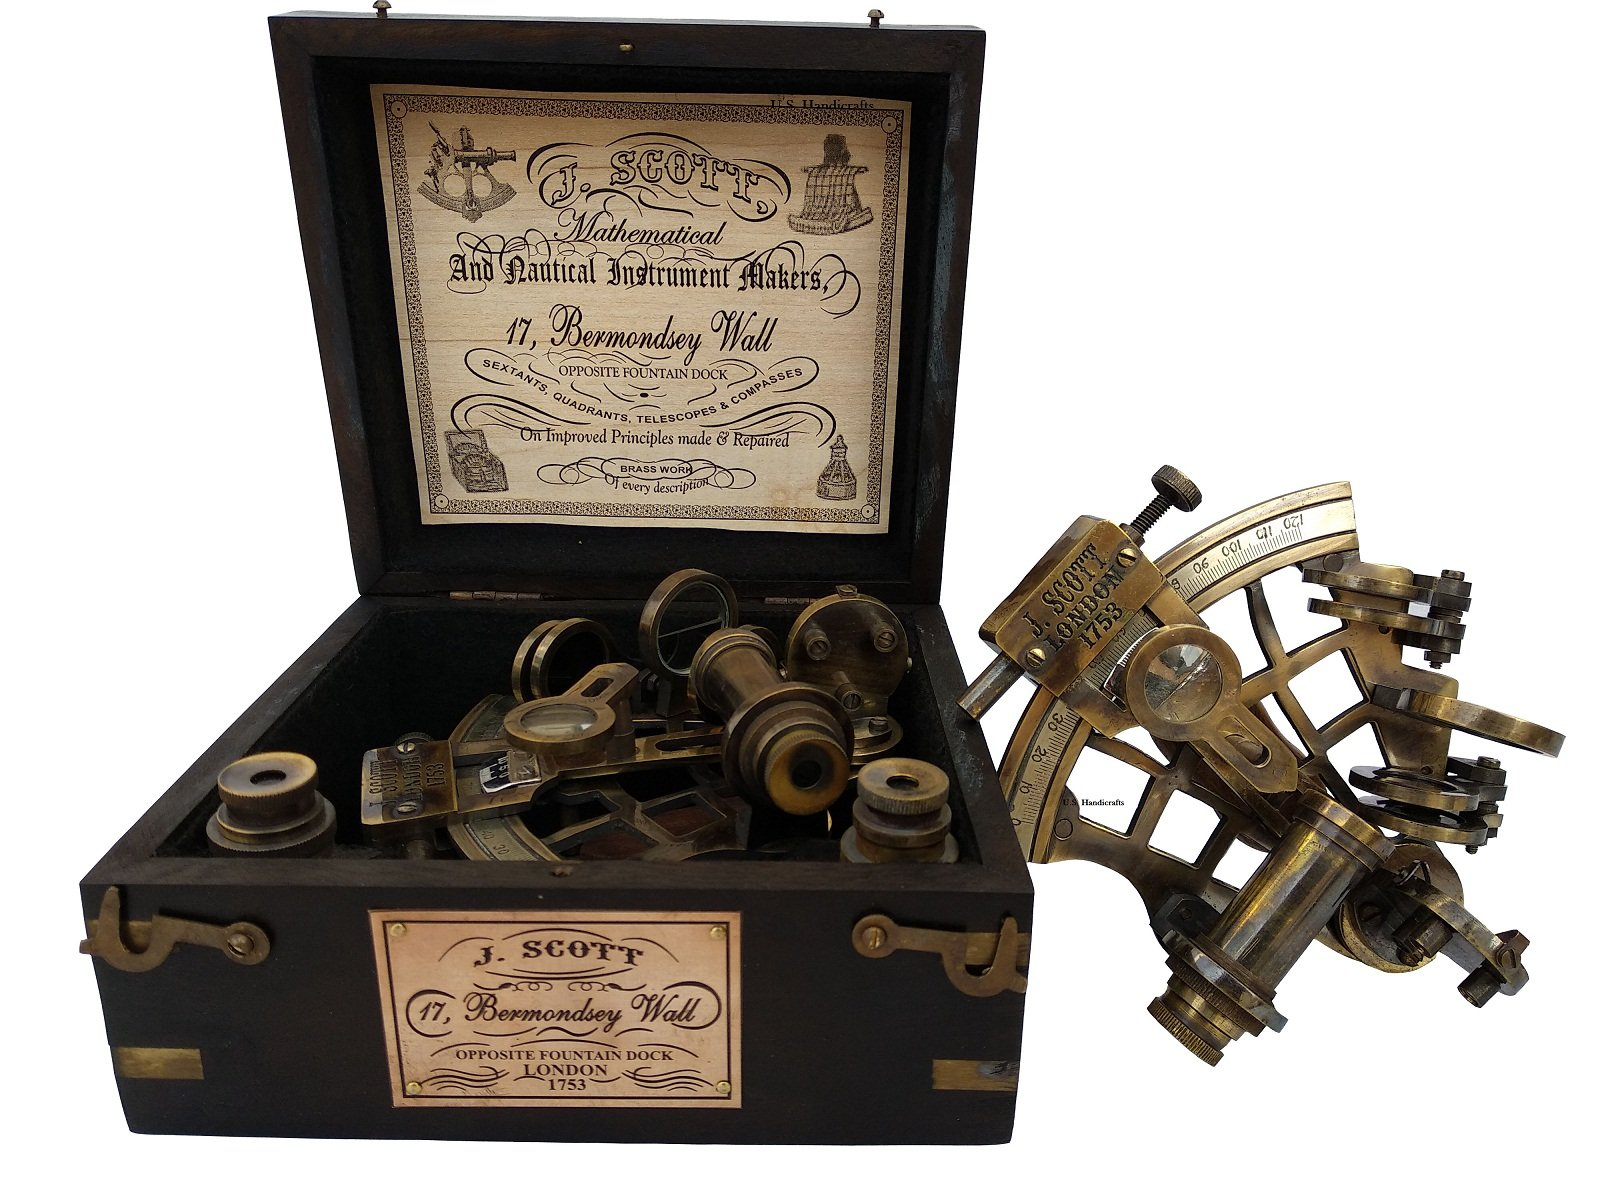 U.S Handicrafts J. Scott London Brass Ship History Sextant with Hardwood Box.J. Scott London Brass Ship History Sextant with Hardwood Box.